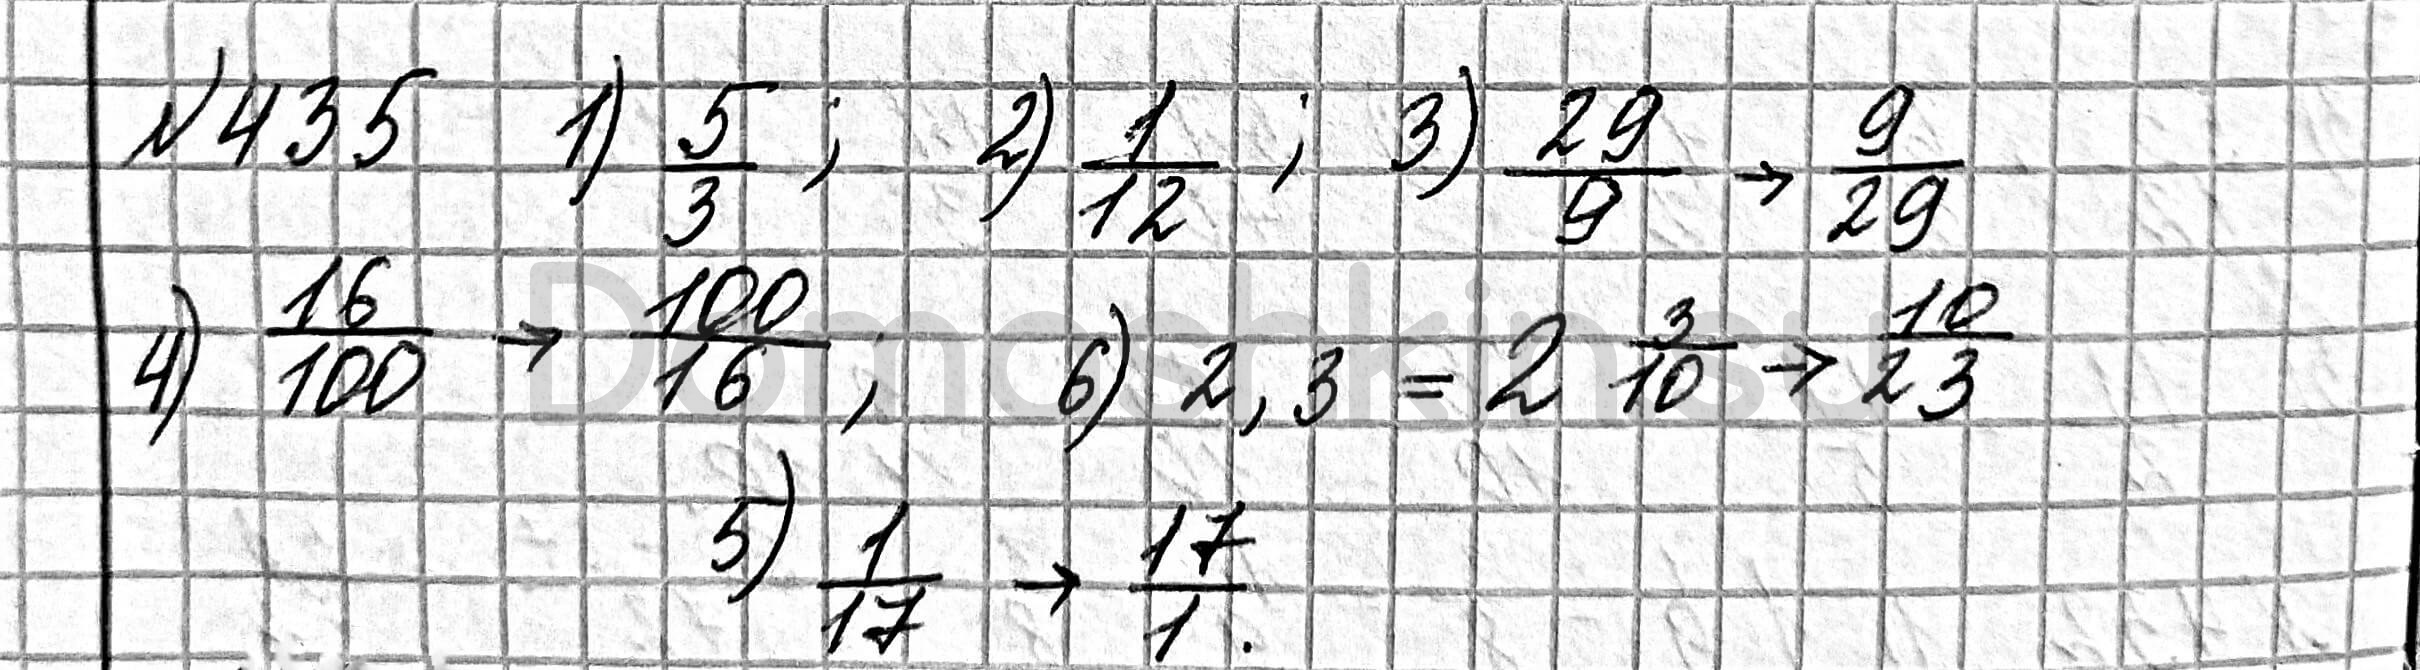 Математика 6 класс учебник Мерзляк номер 435 решение